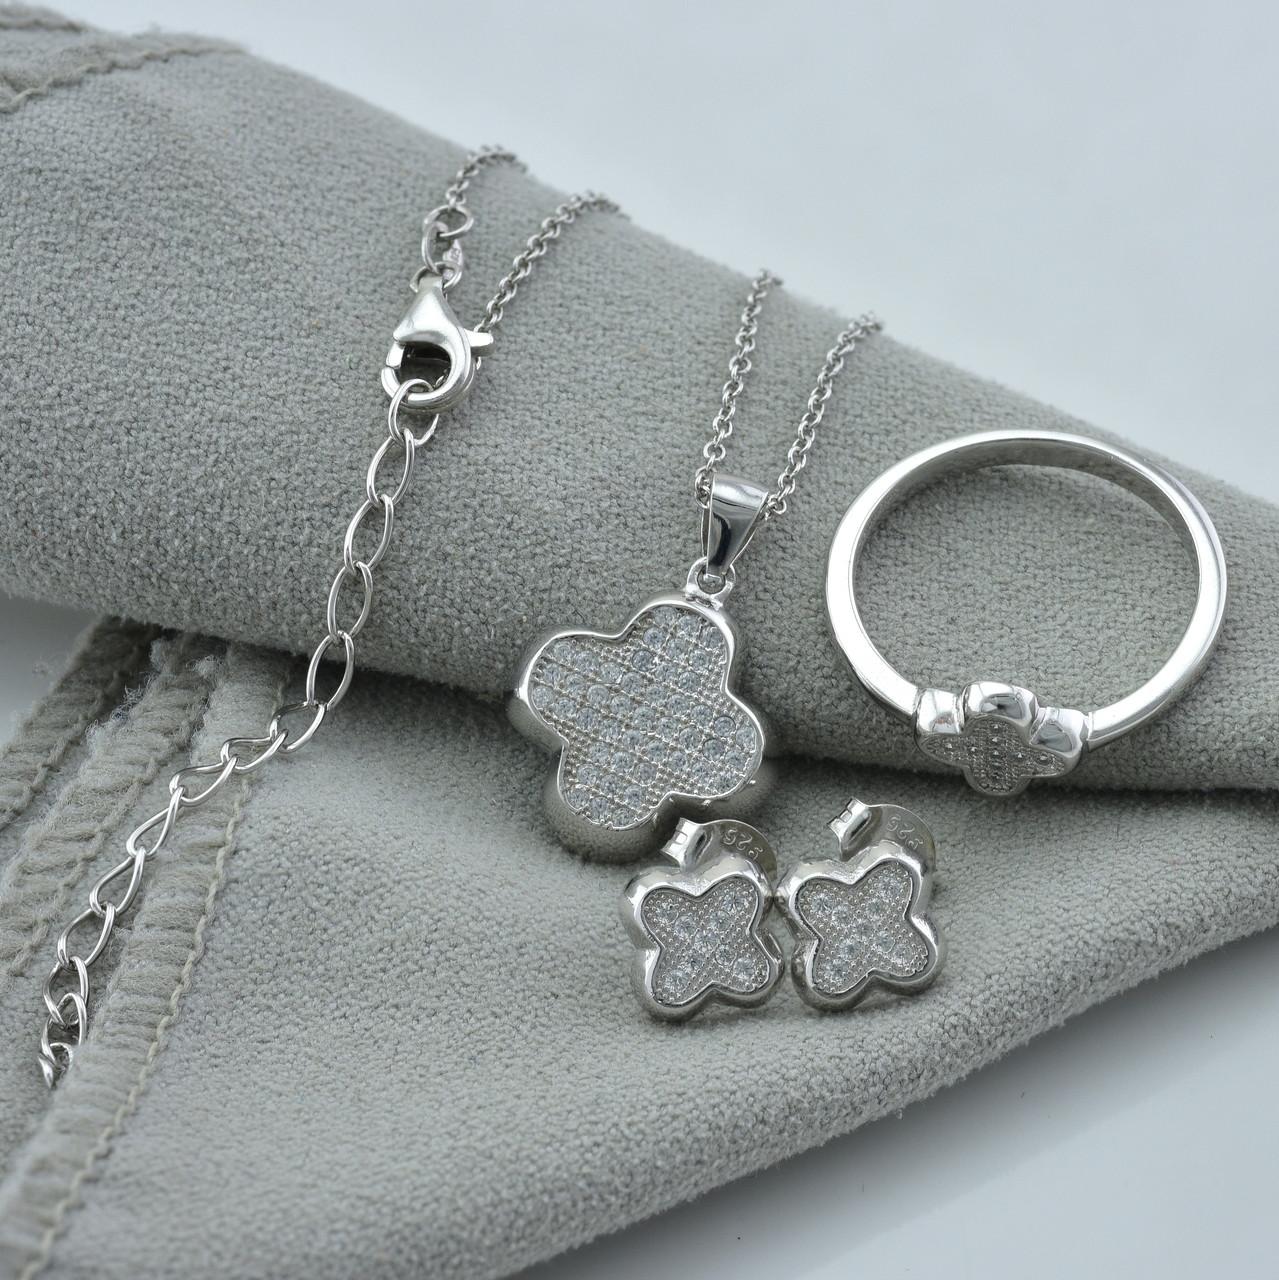 Серебряный набор кольцо размер 18 + серьги 8х8 мм +цепочка 40+5 см + кулон 23х15 мм вставка белые фианиты